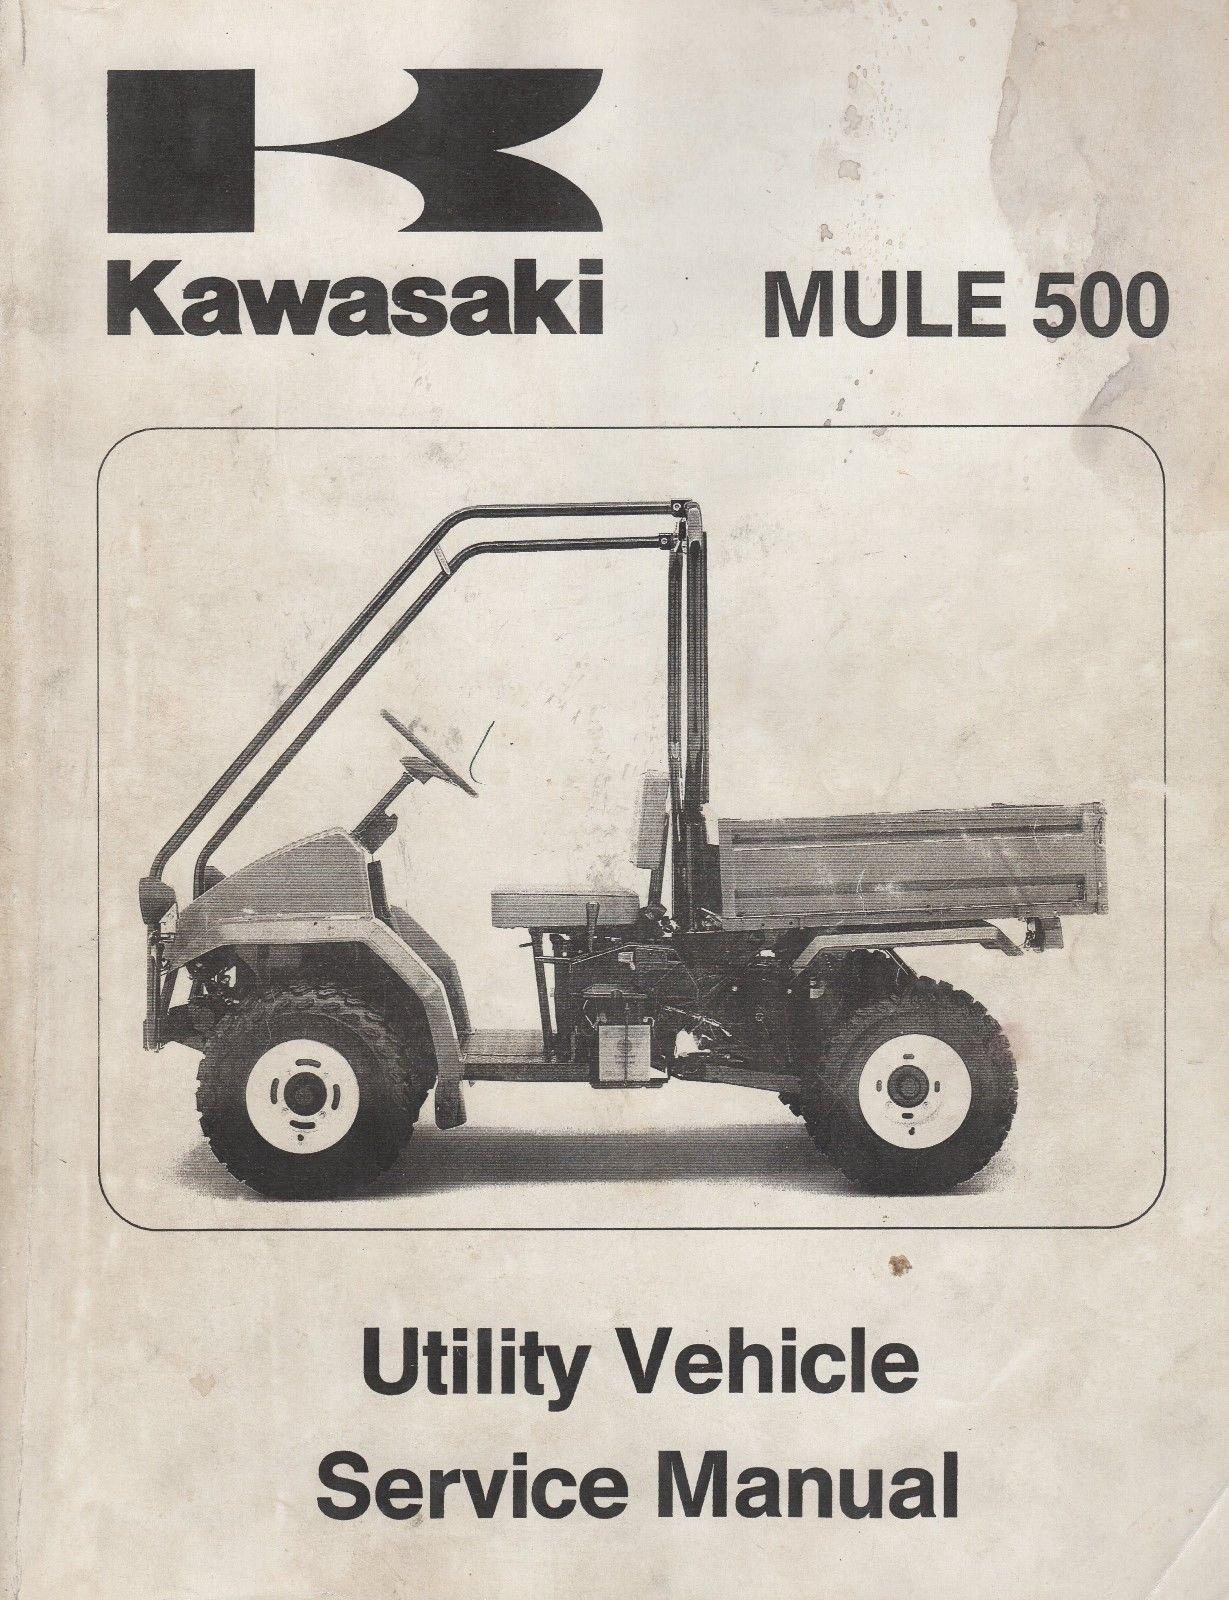 1991-1998 KAWASAKI UTILITY ATV MULE 500 SERVICE MANUAL P/N 99924-1146-02  (876): KAWASAKI: Amazon.com: Books